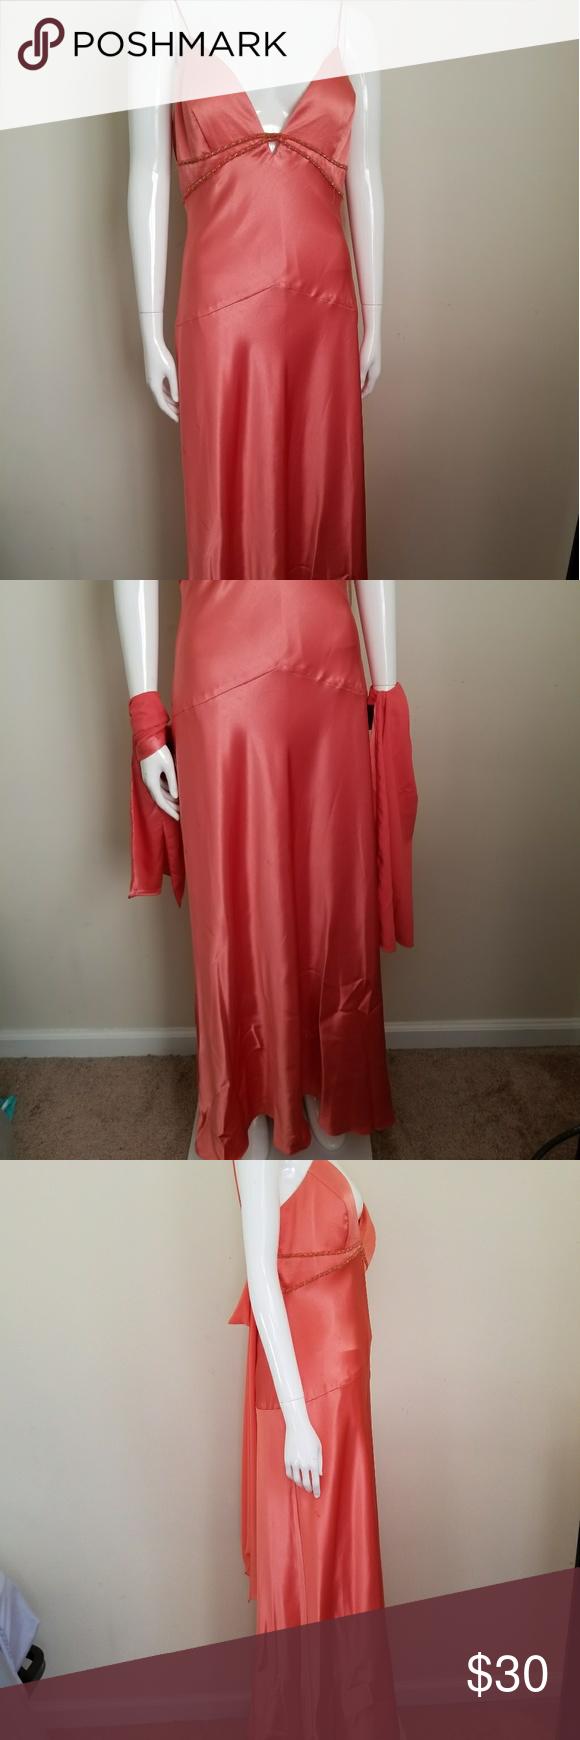 Orange promformal dress dress brands long prom dresses and dress